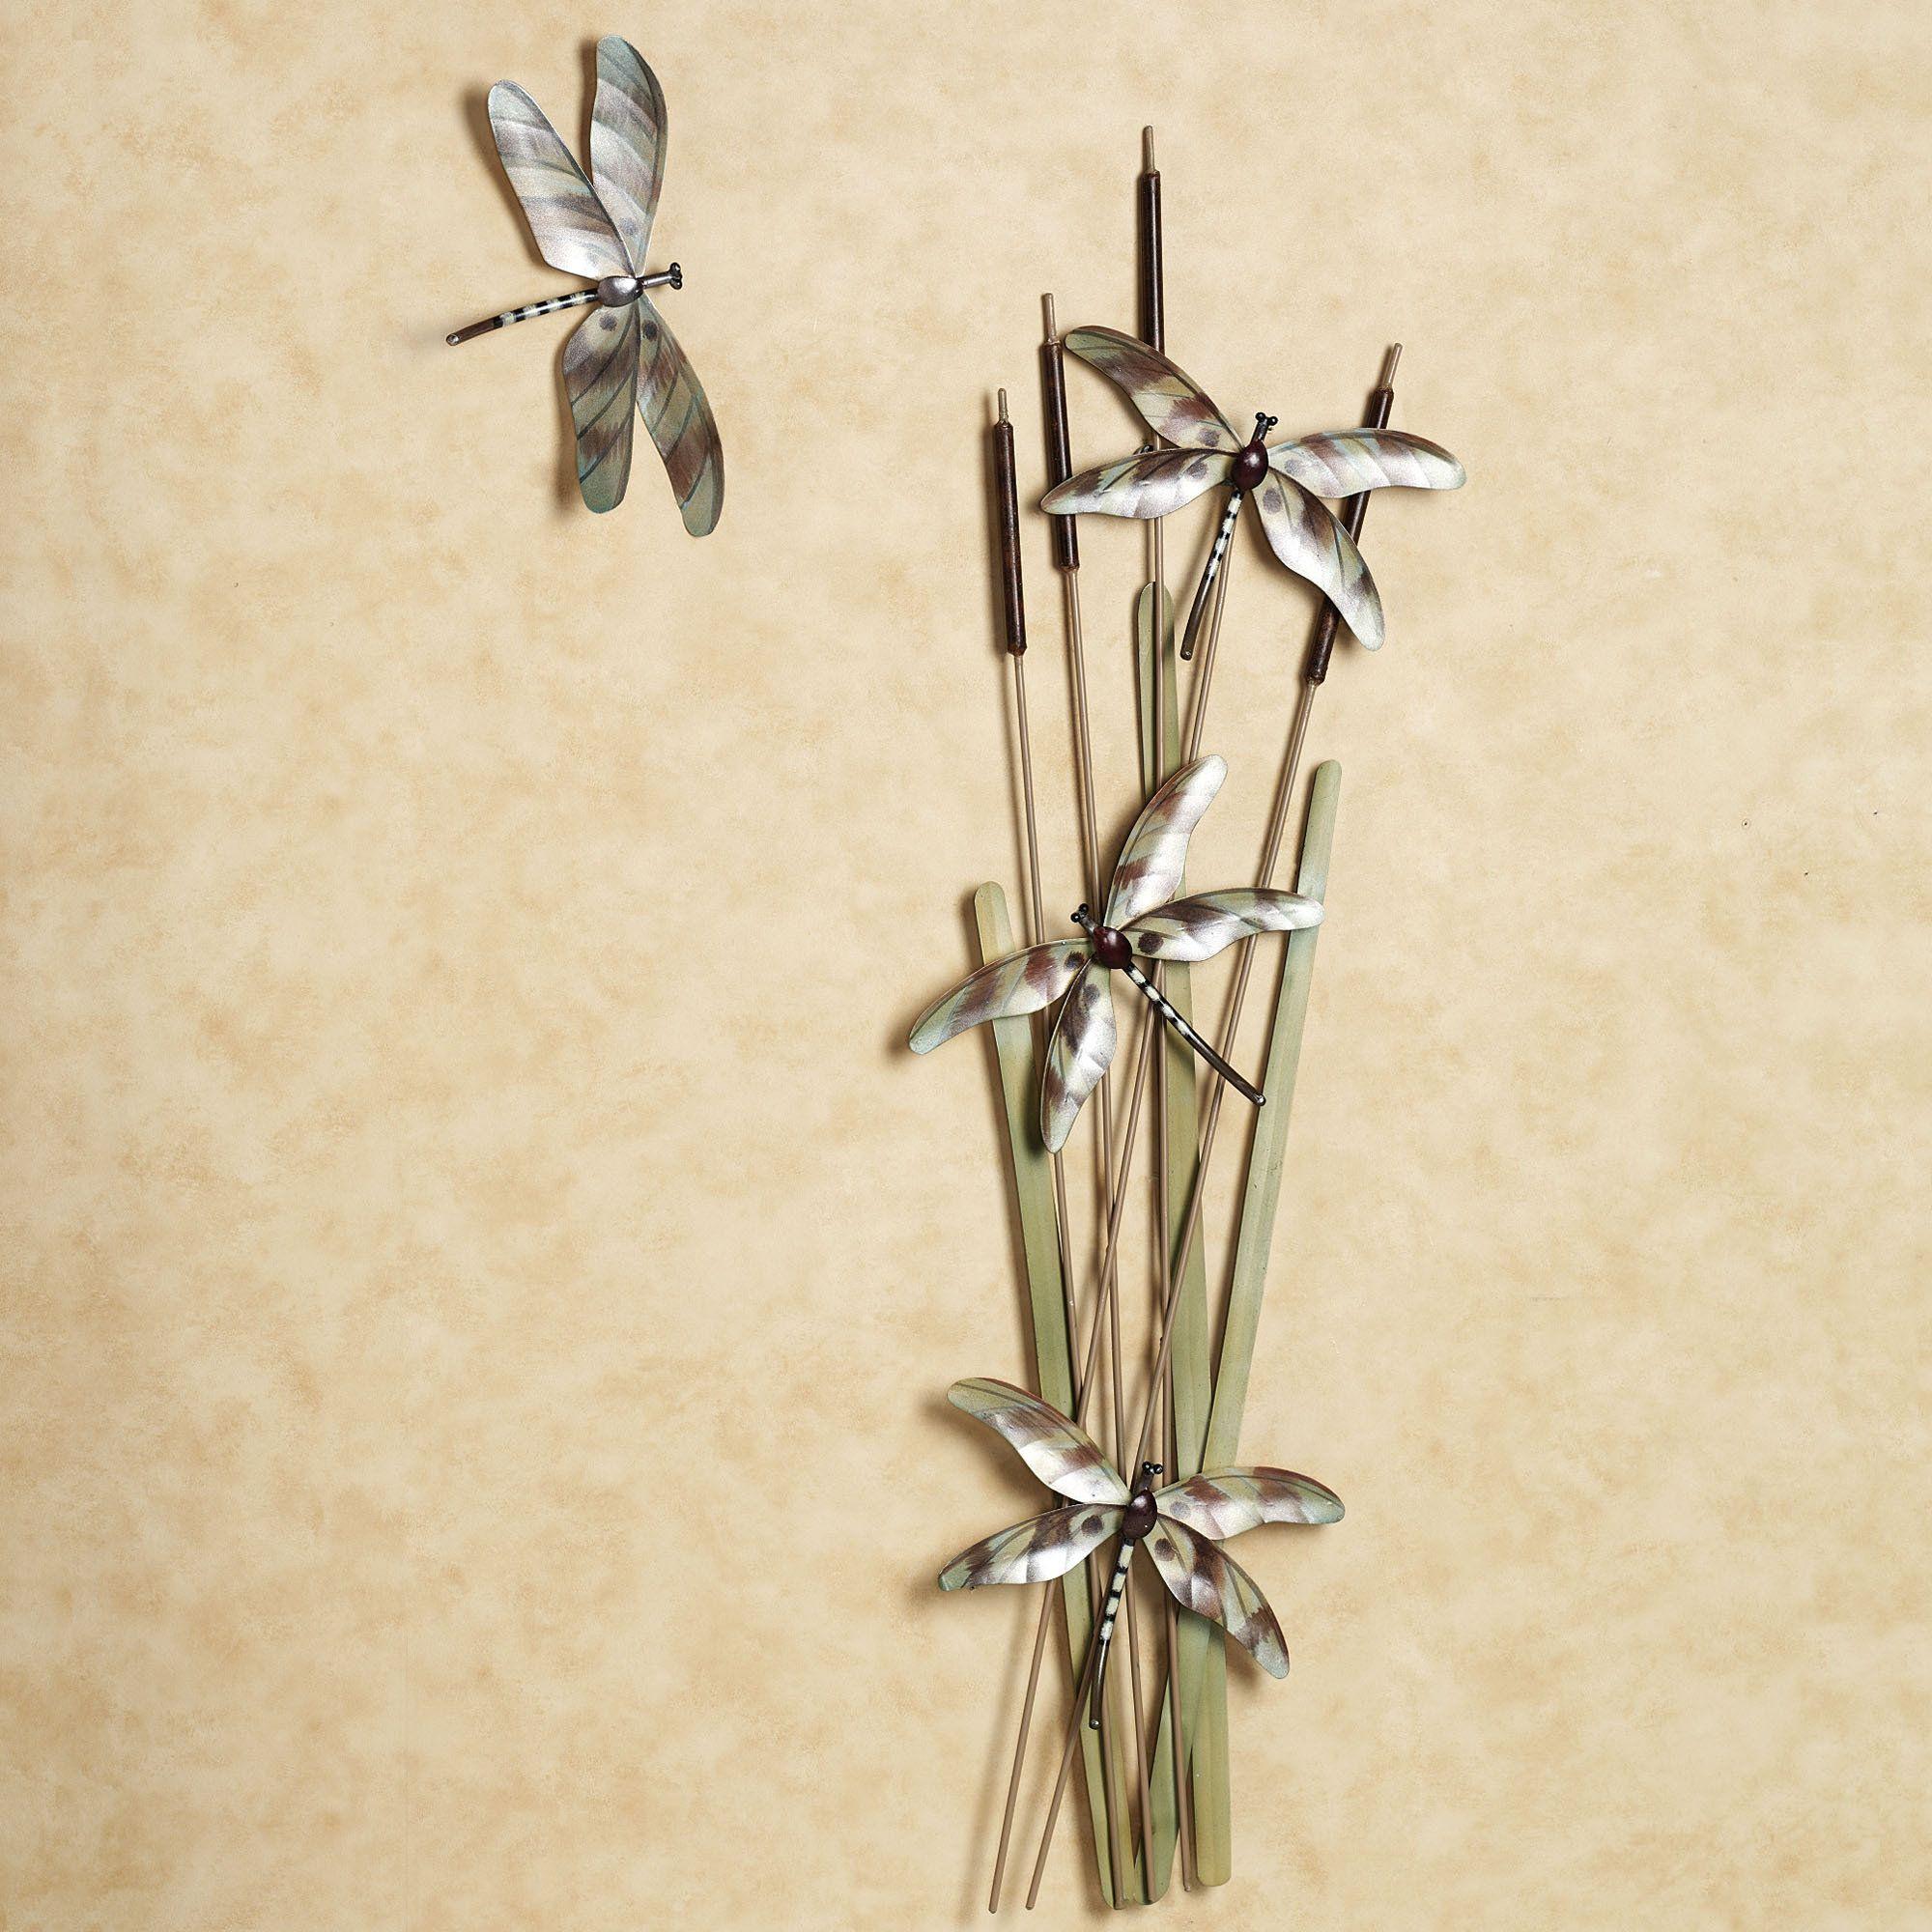 Dragonfly Metal Wall Art skimming the bulrush dragonfly metal wall sculpture set | metal